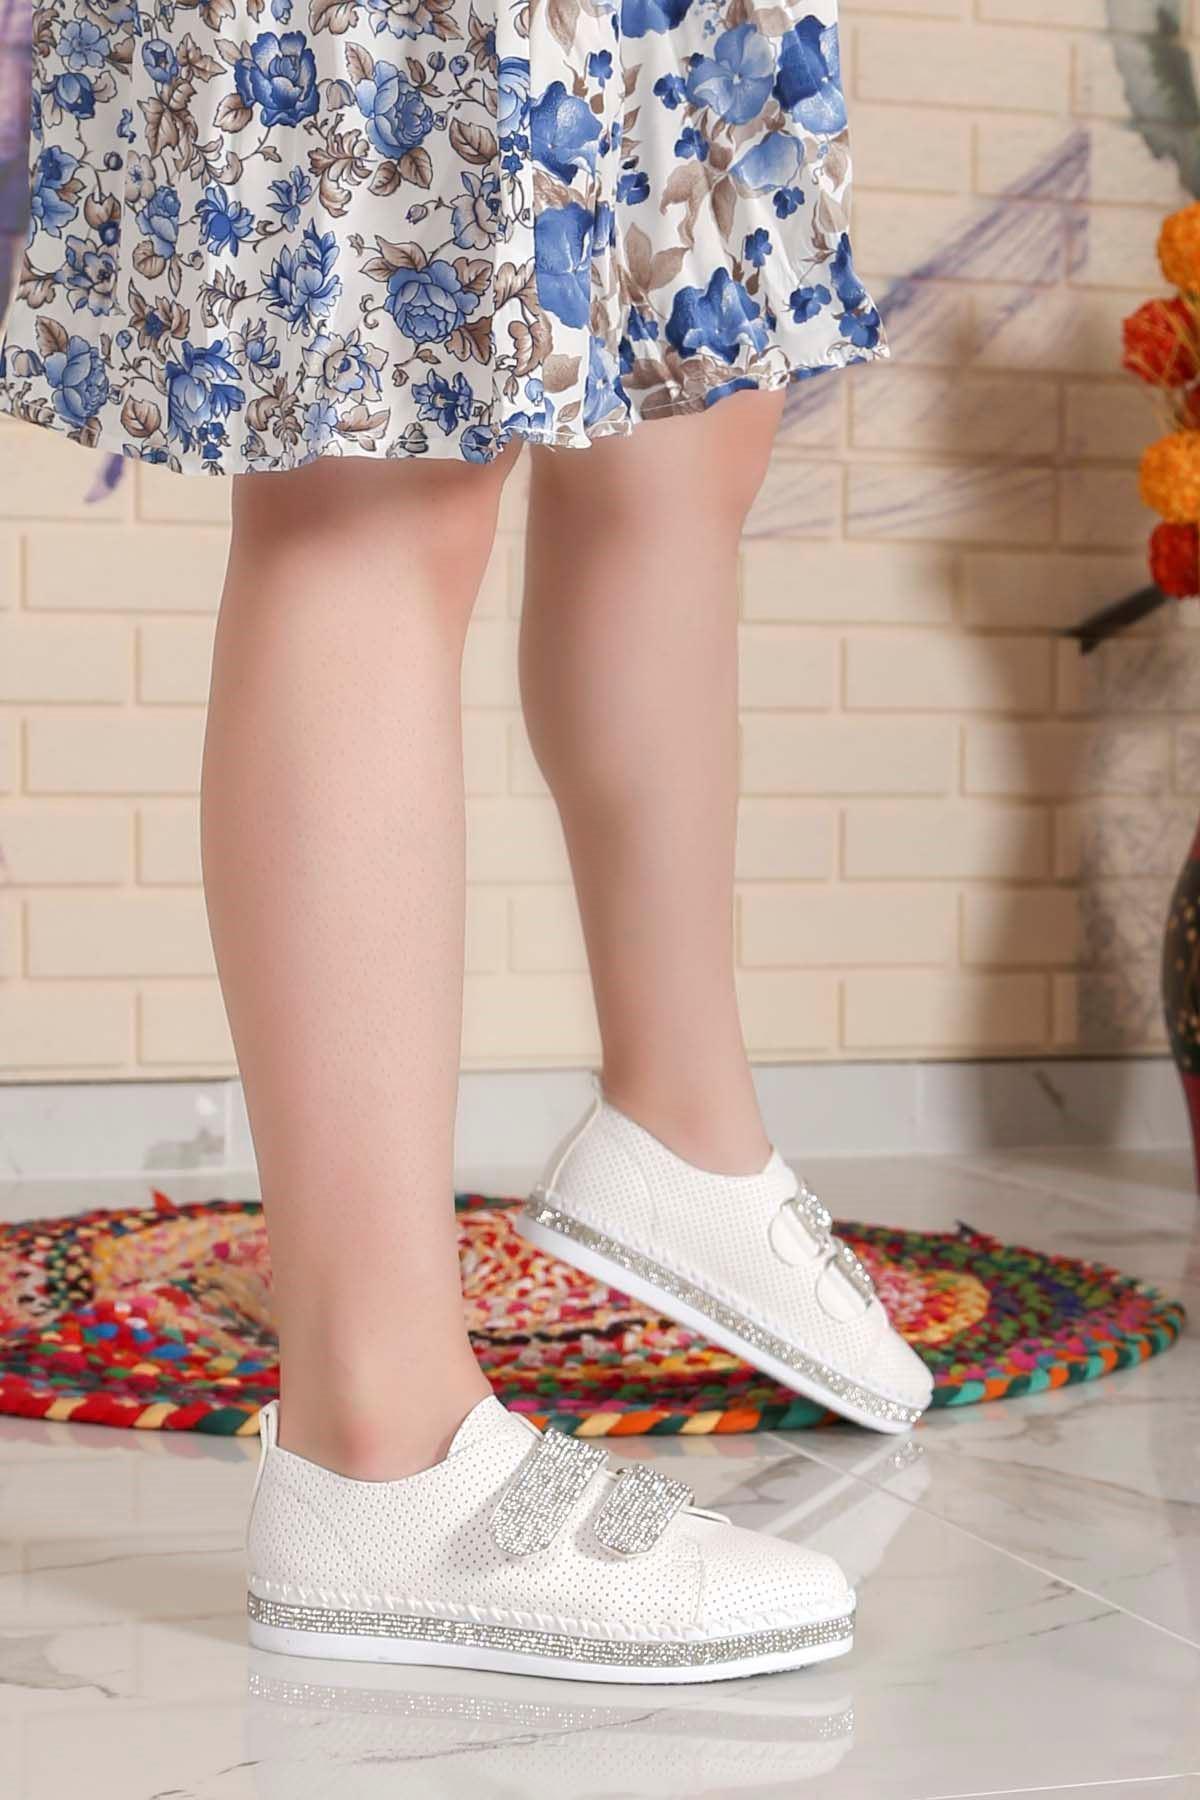 My-Fit 101 Cırtlı sneakers Taş Detay Beyaz